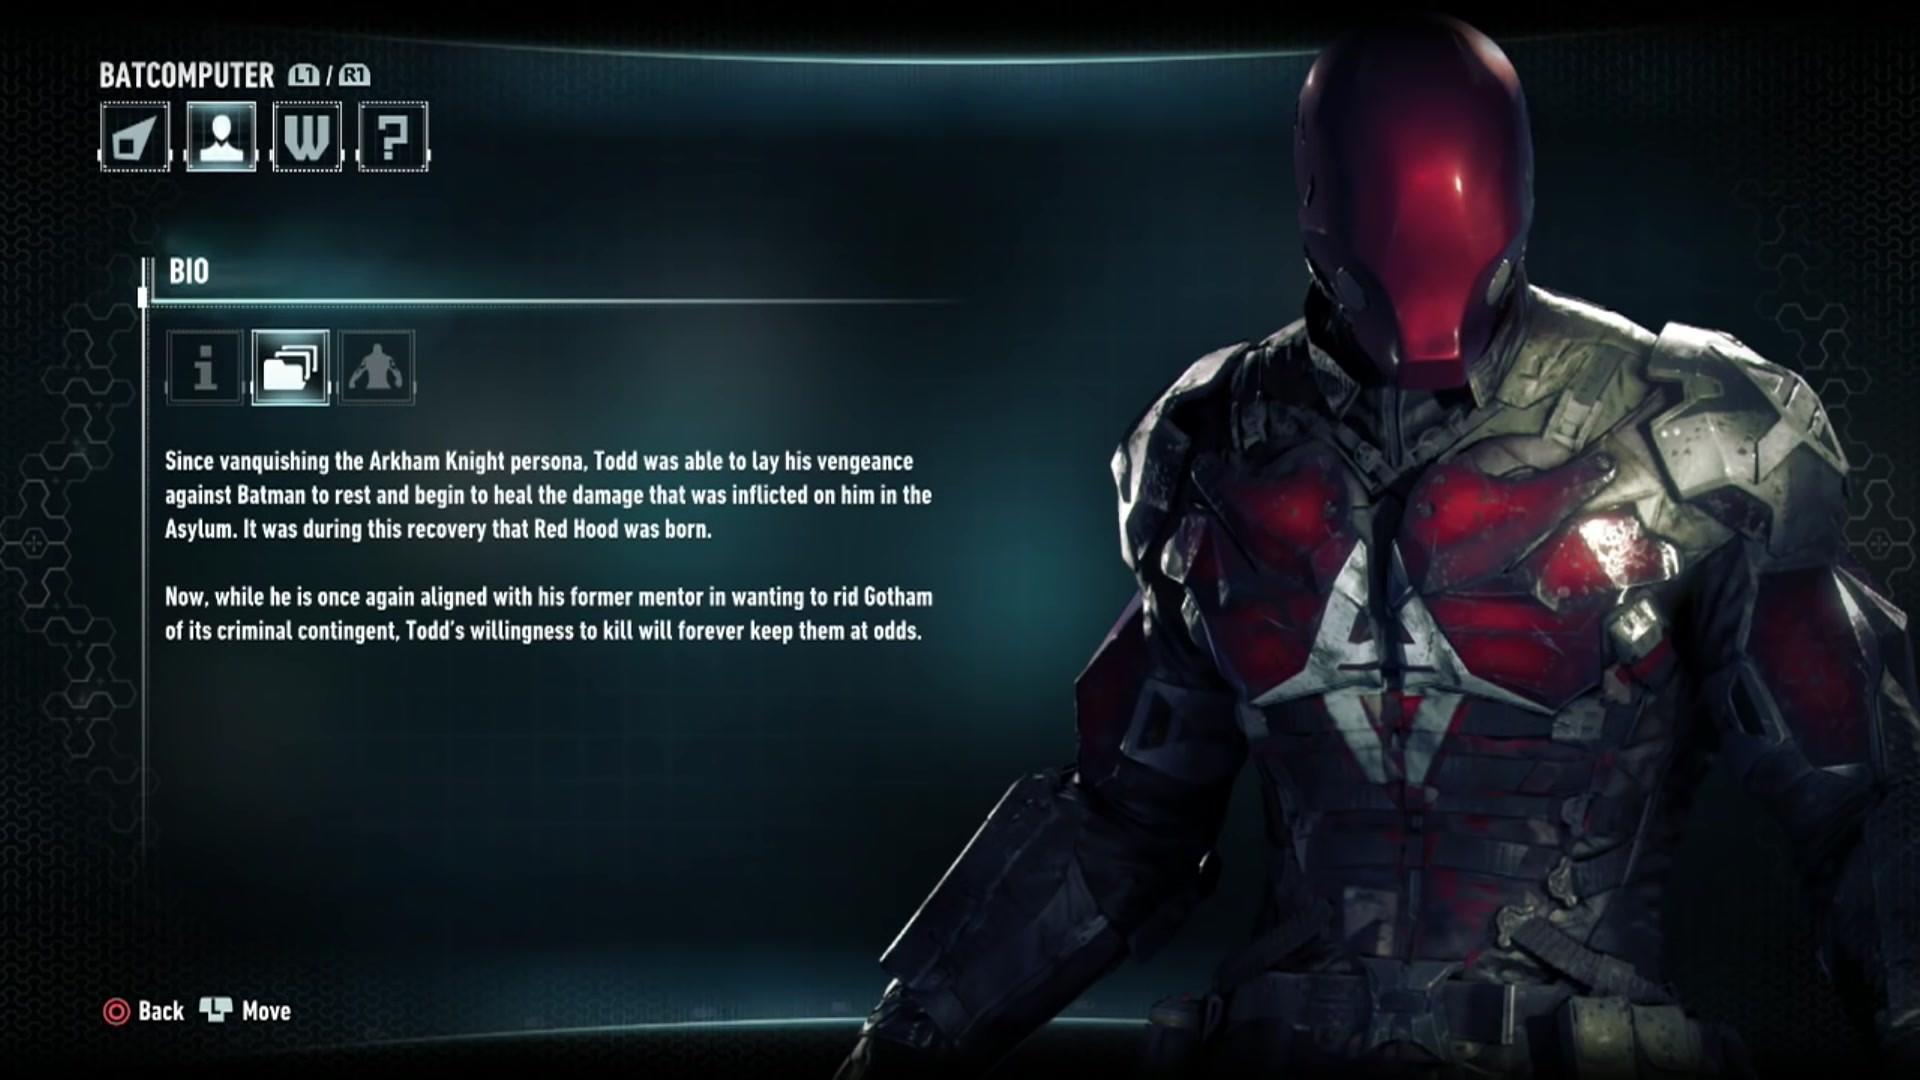 Jason Todd Red Hood Batman Arkham Knight wallpapers (61 Wallpapers)